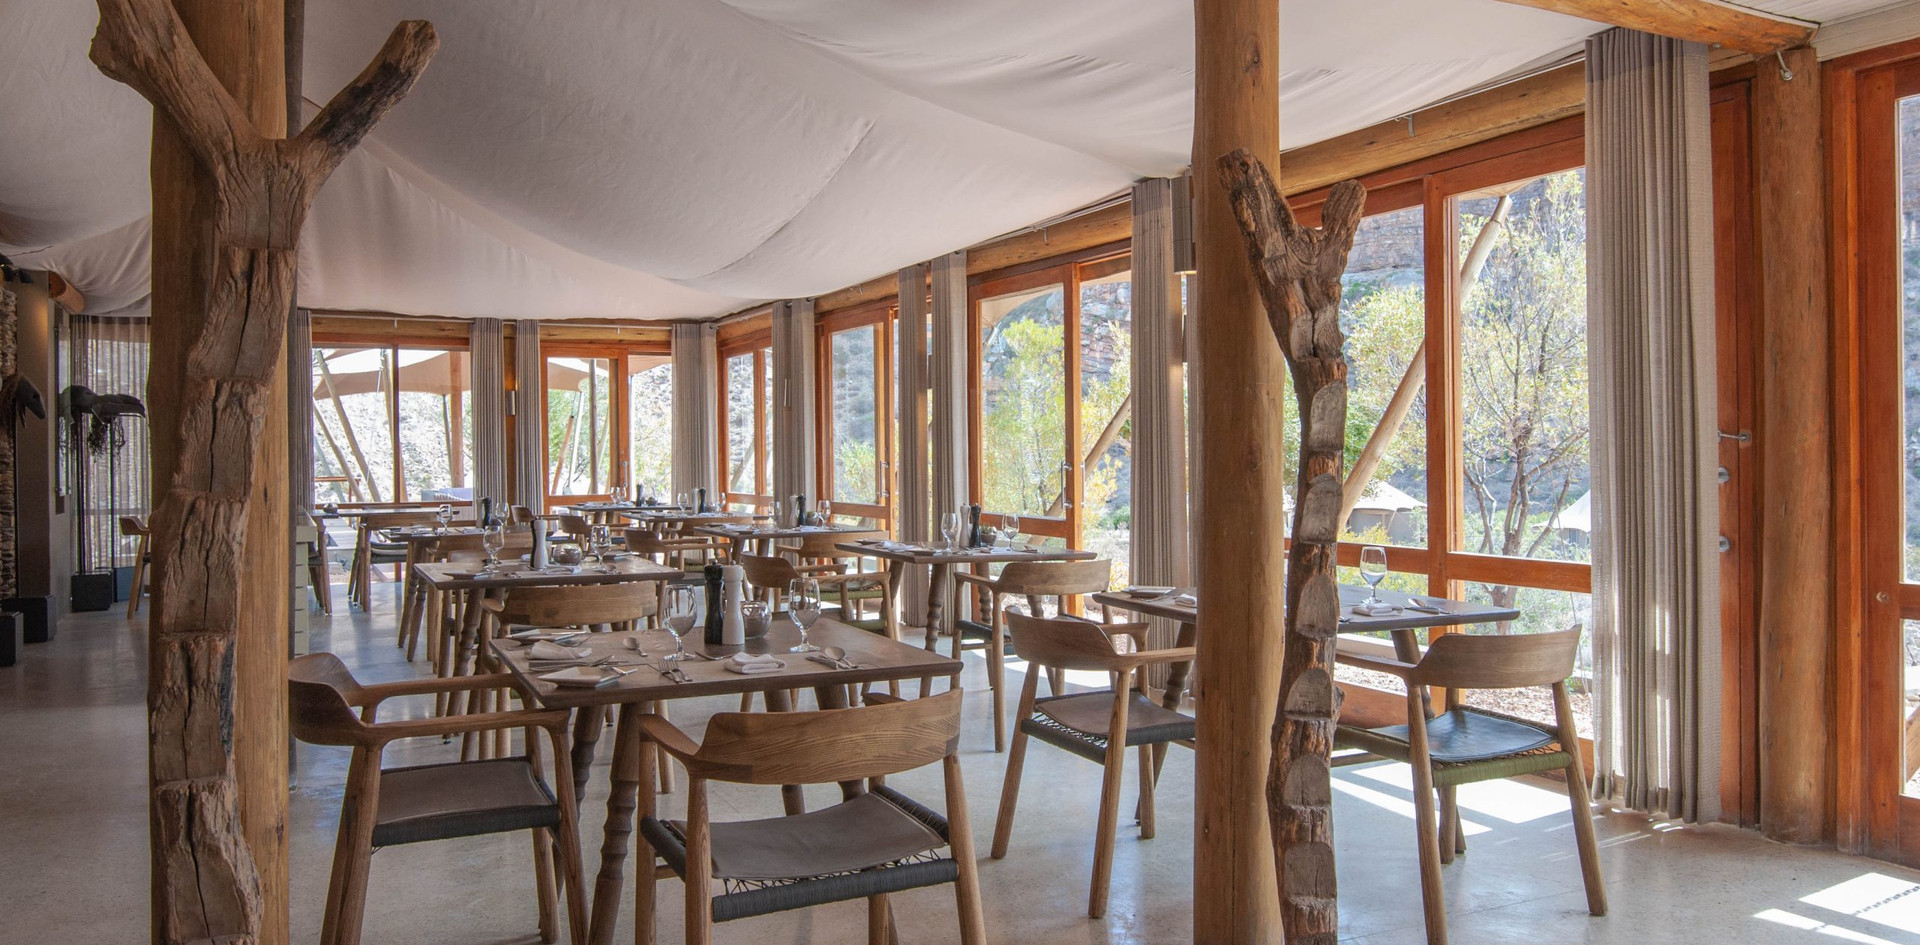 Dwyka-Dining-Room-scaled.jpg